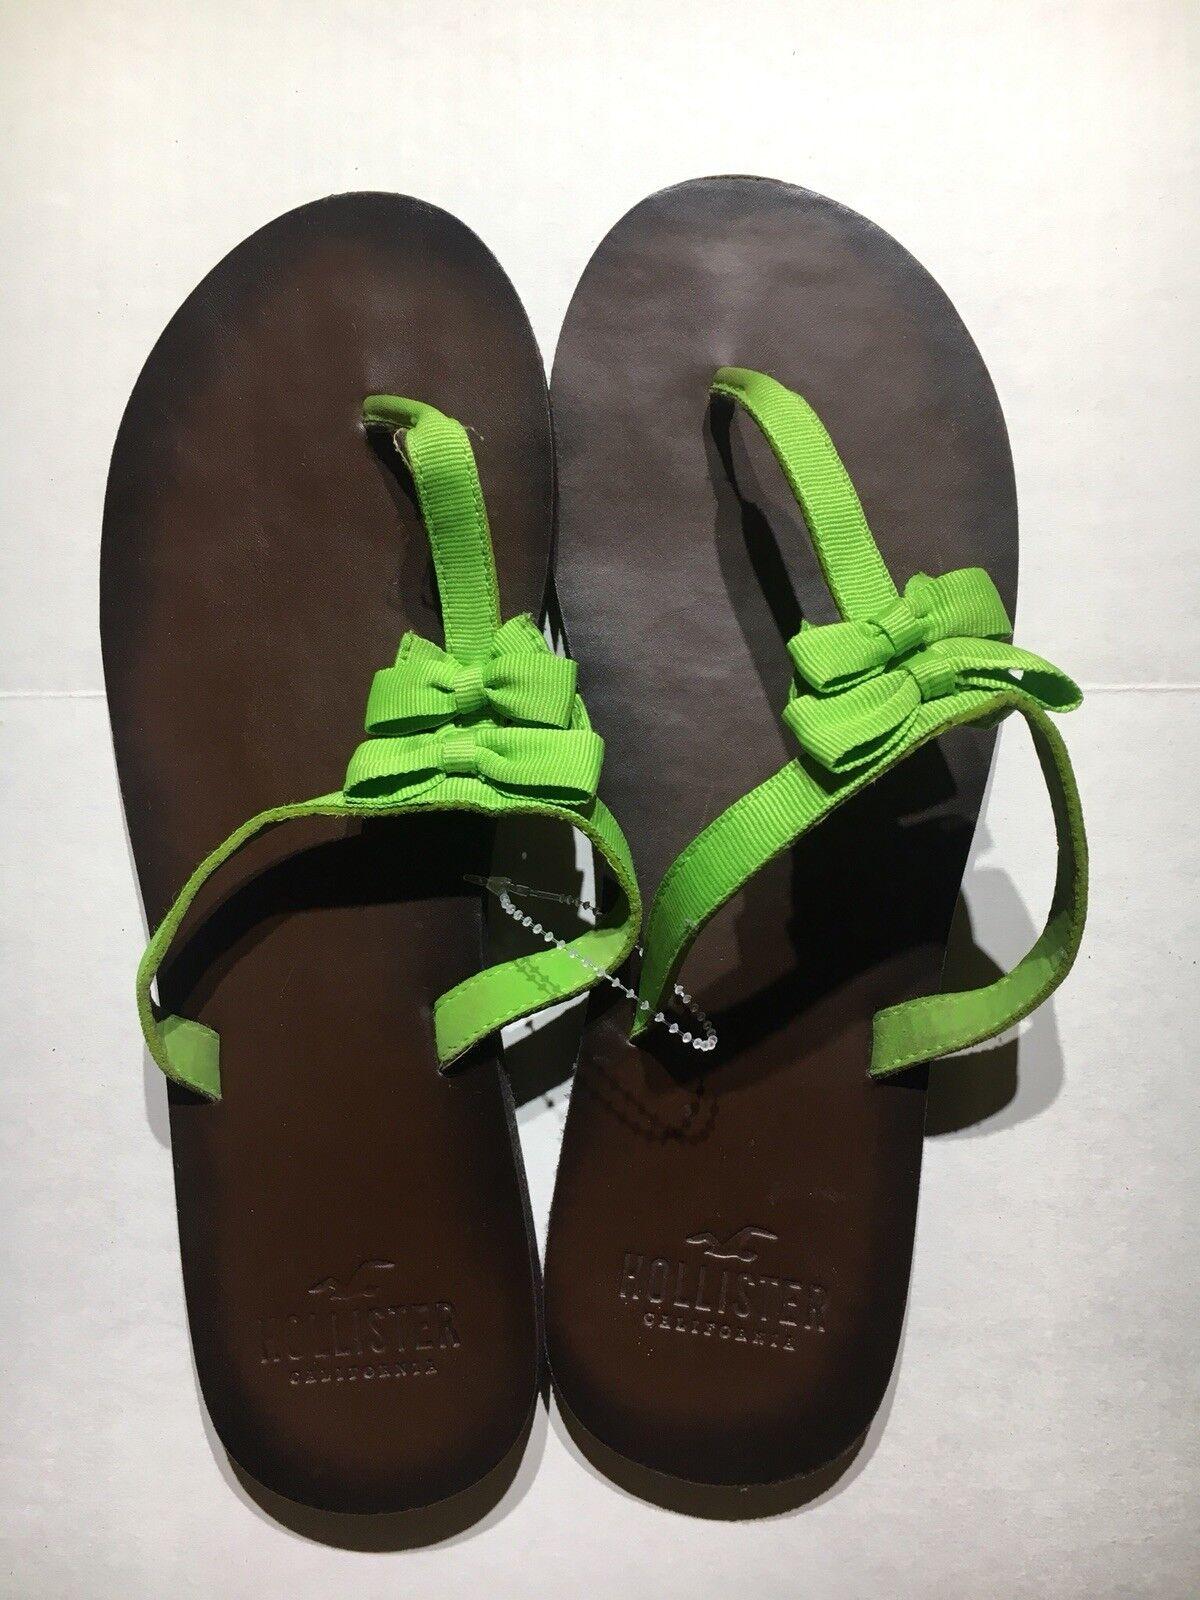 EUC!! Bow Women's Hollister Green Strap Bow EUC!! Flip Flop Size Medium 8a0f9b